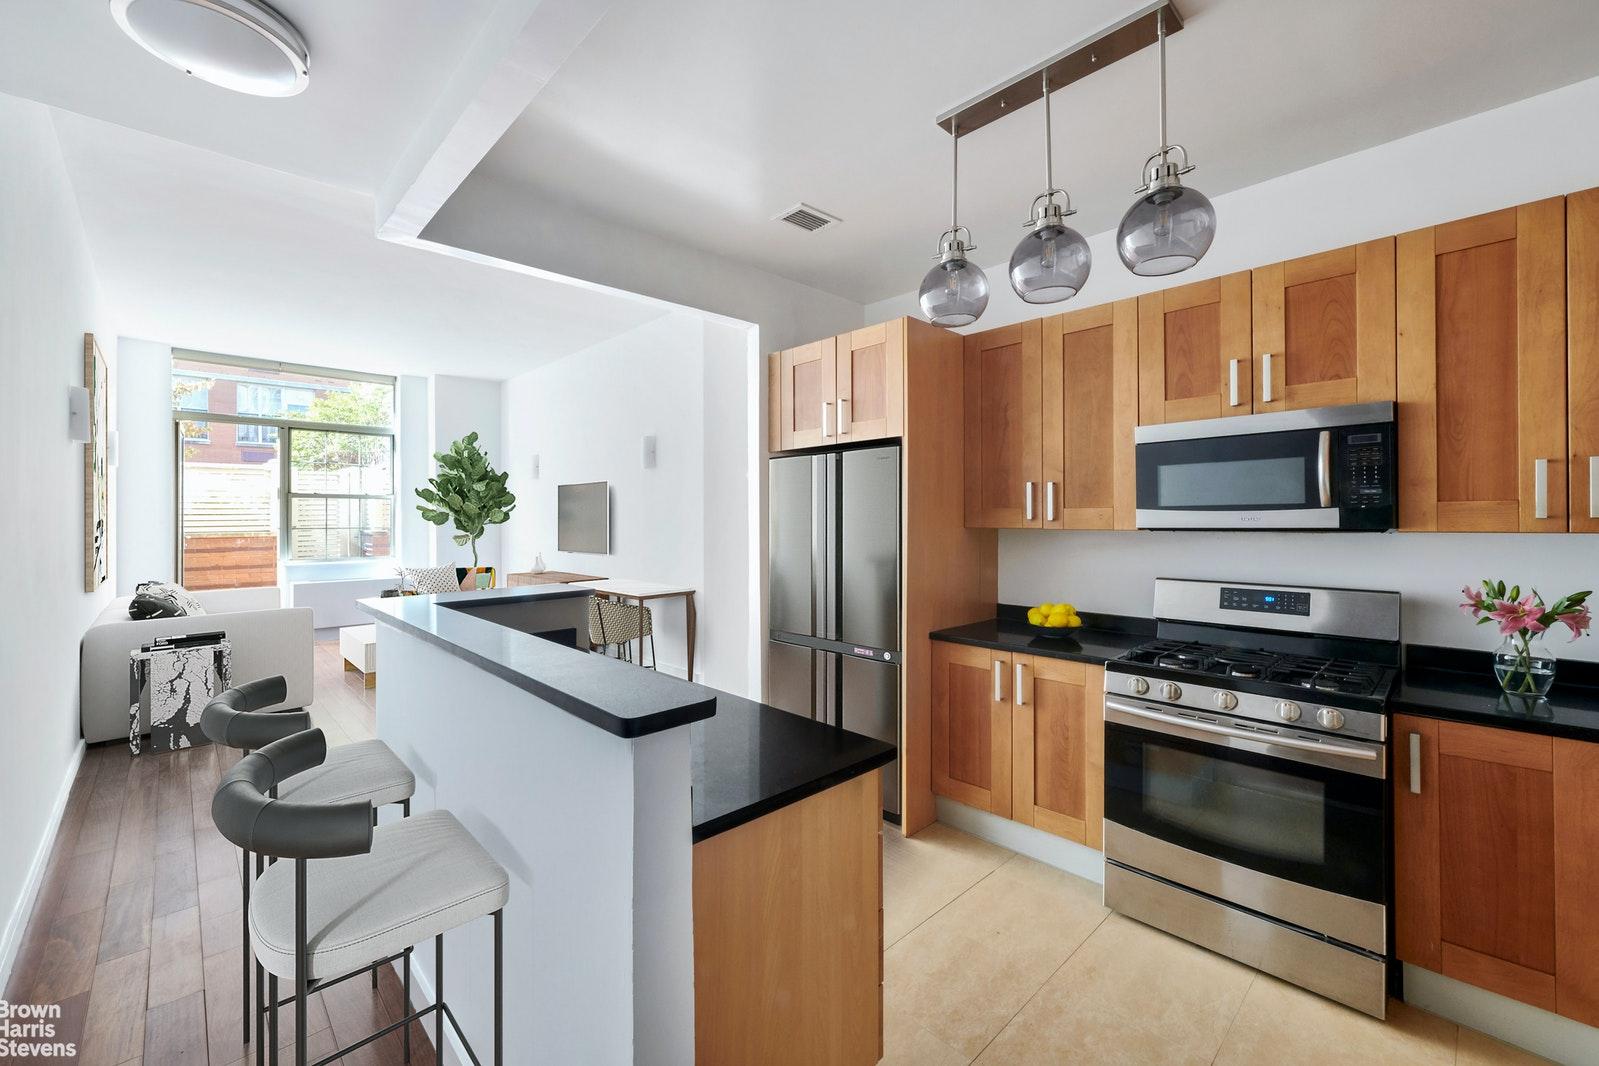 310 WEST 120TH STREET 1C, Central Harlem, $1,200,000, Web #: 20402280